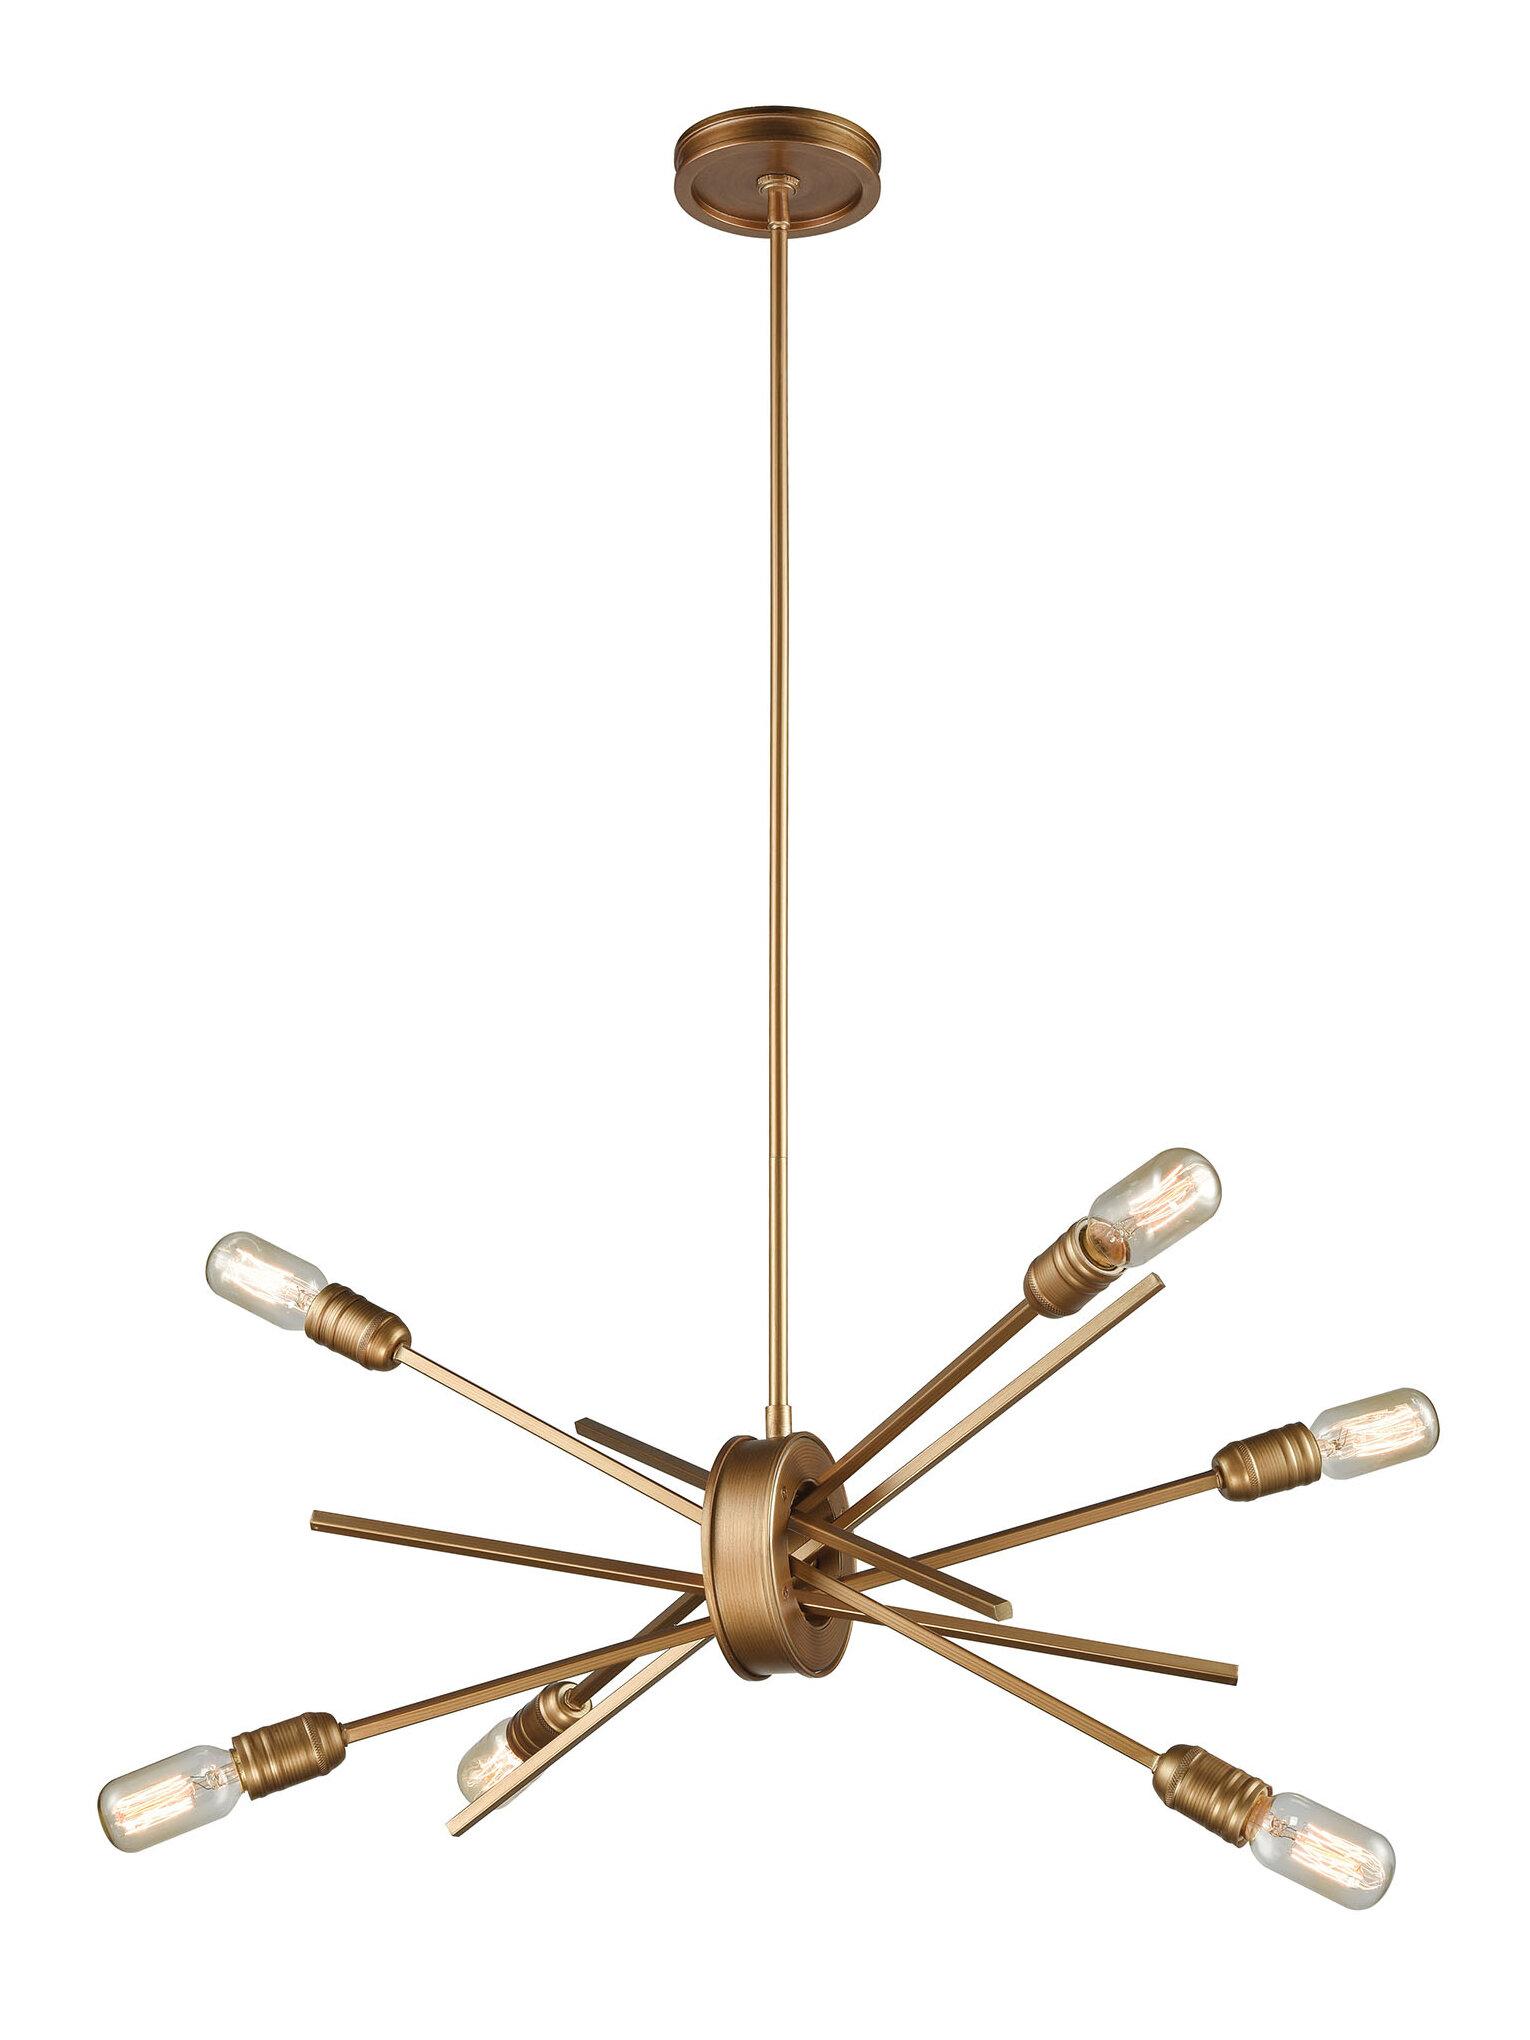 stilnovo sputnik oval ivory style sciolari chandelier product shades in arteluce sarfatti lights the brass